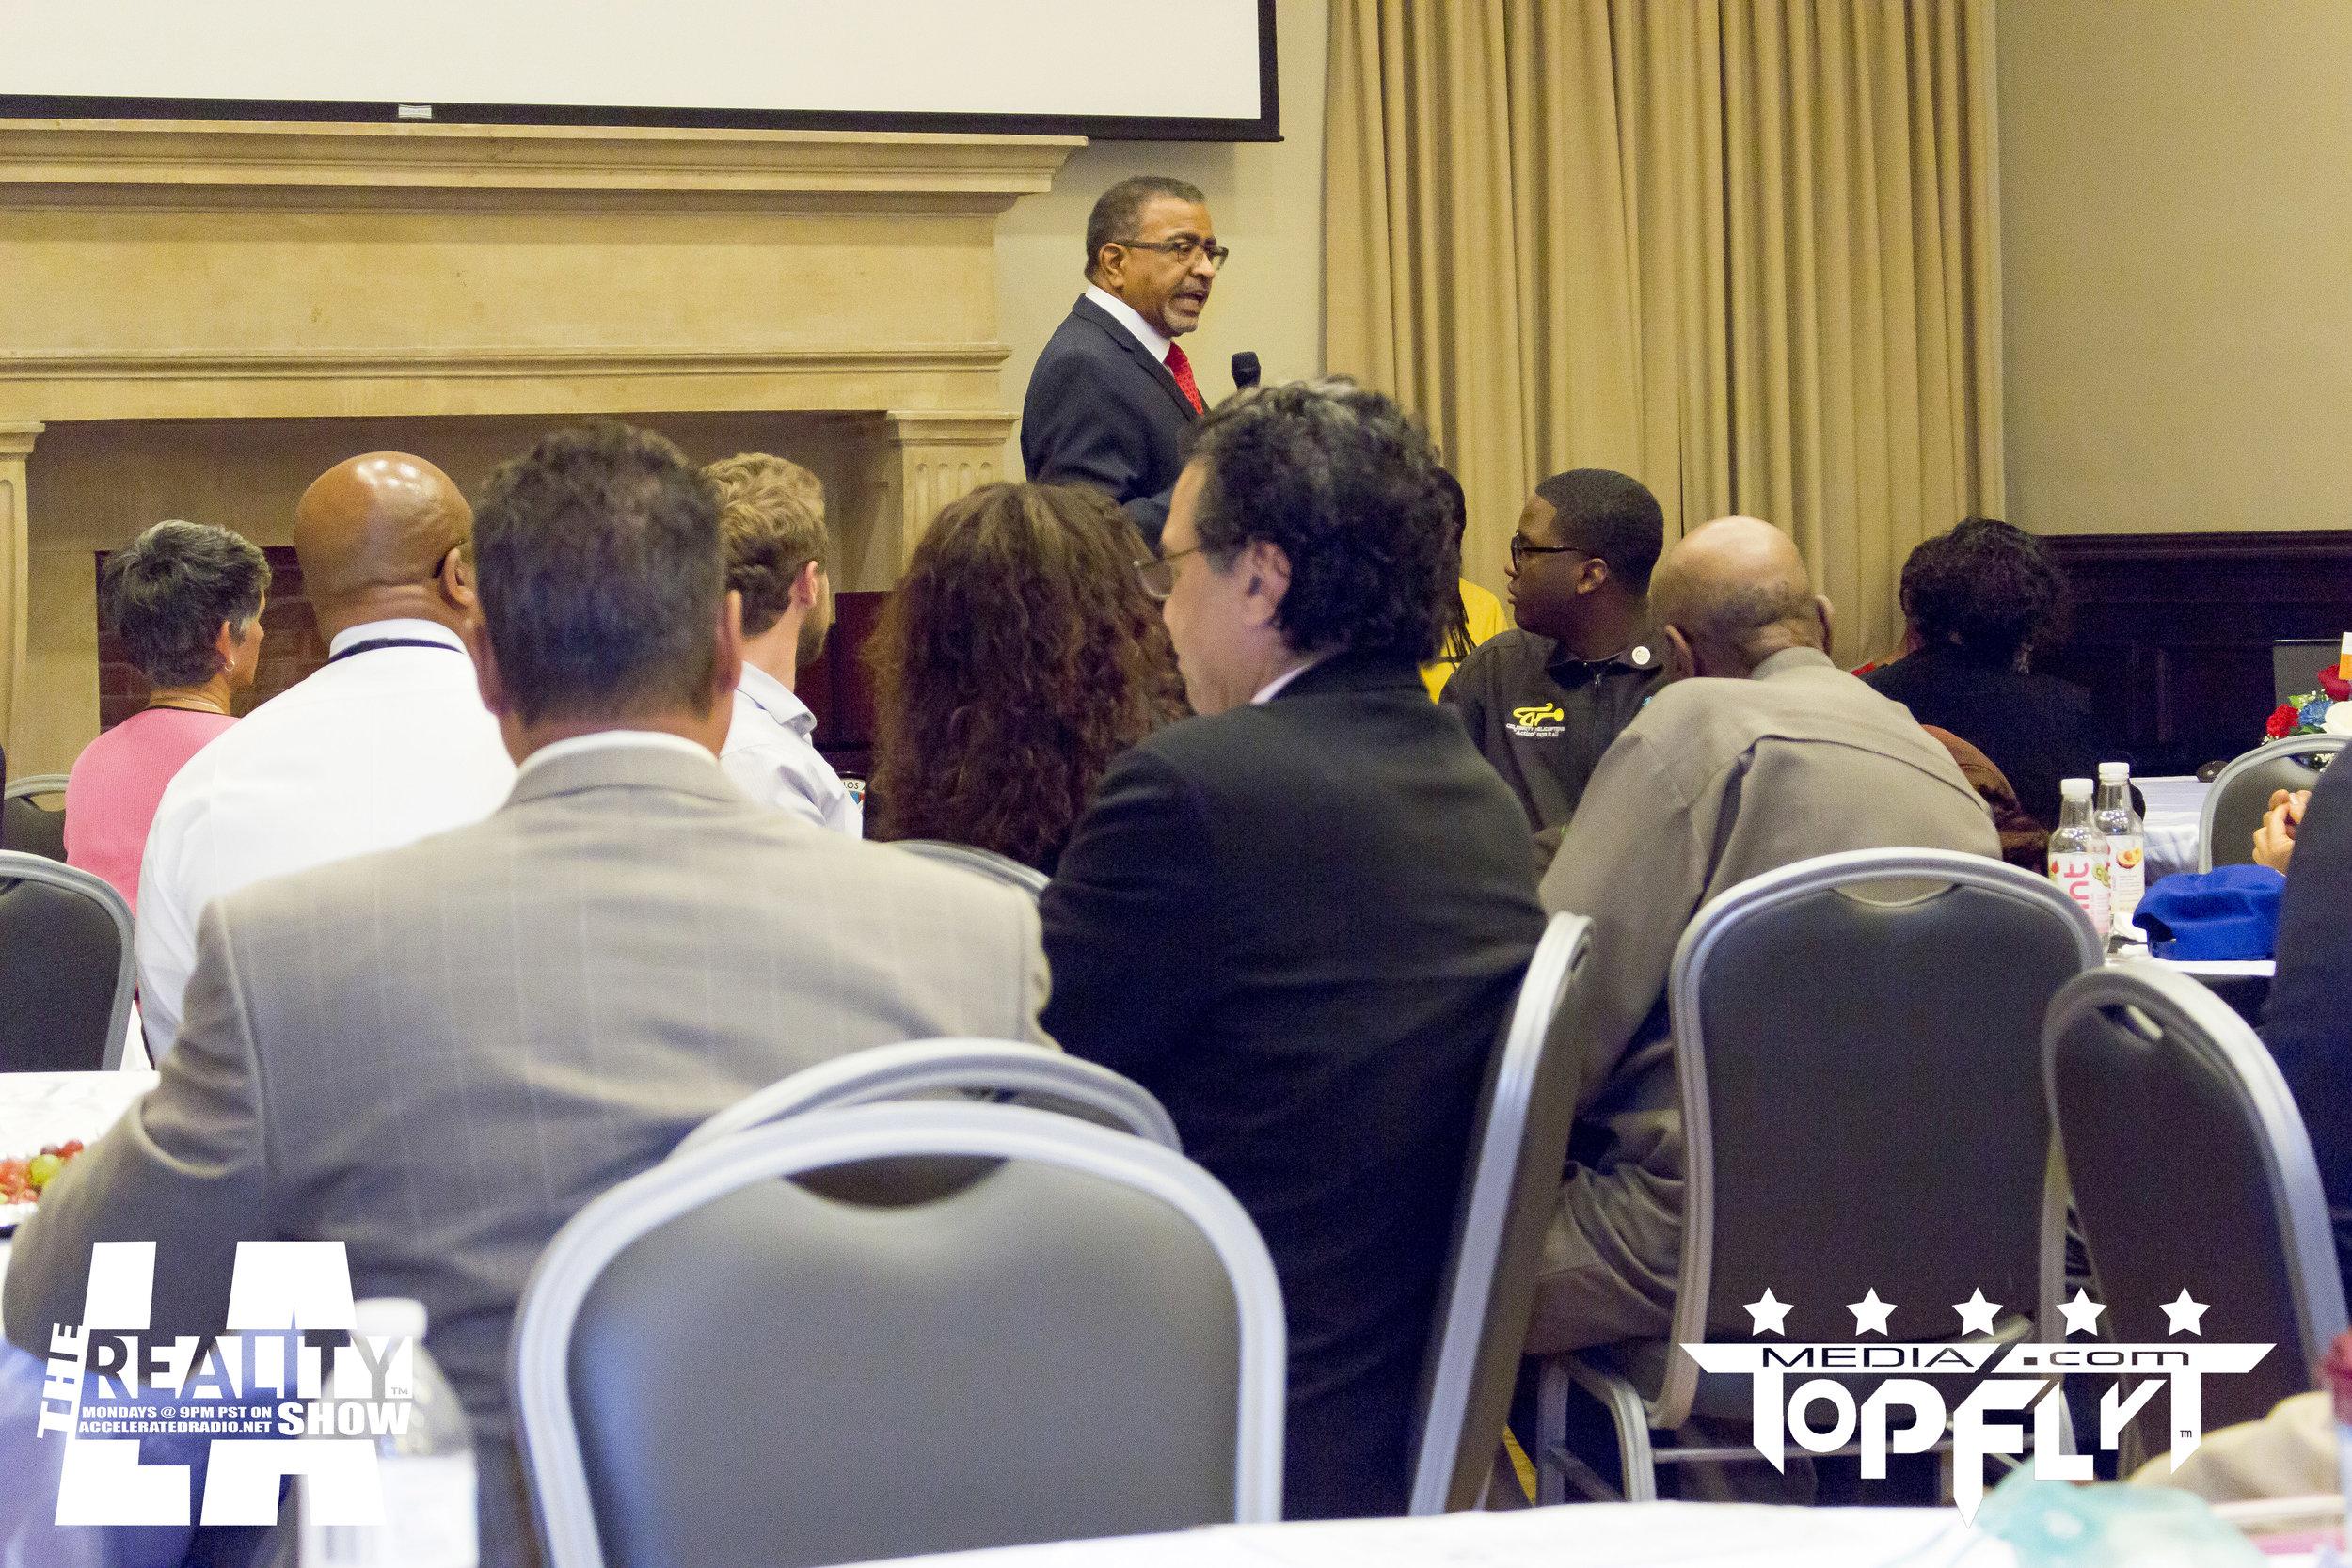 The Reality Show LA - Tuskegee Airmen 75th Anniversary VIP Reception_78.jpg